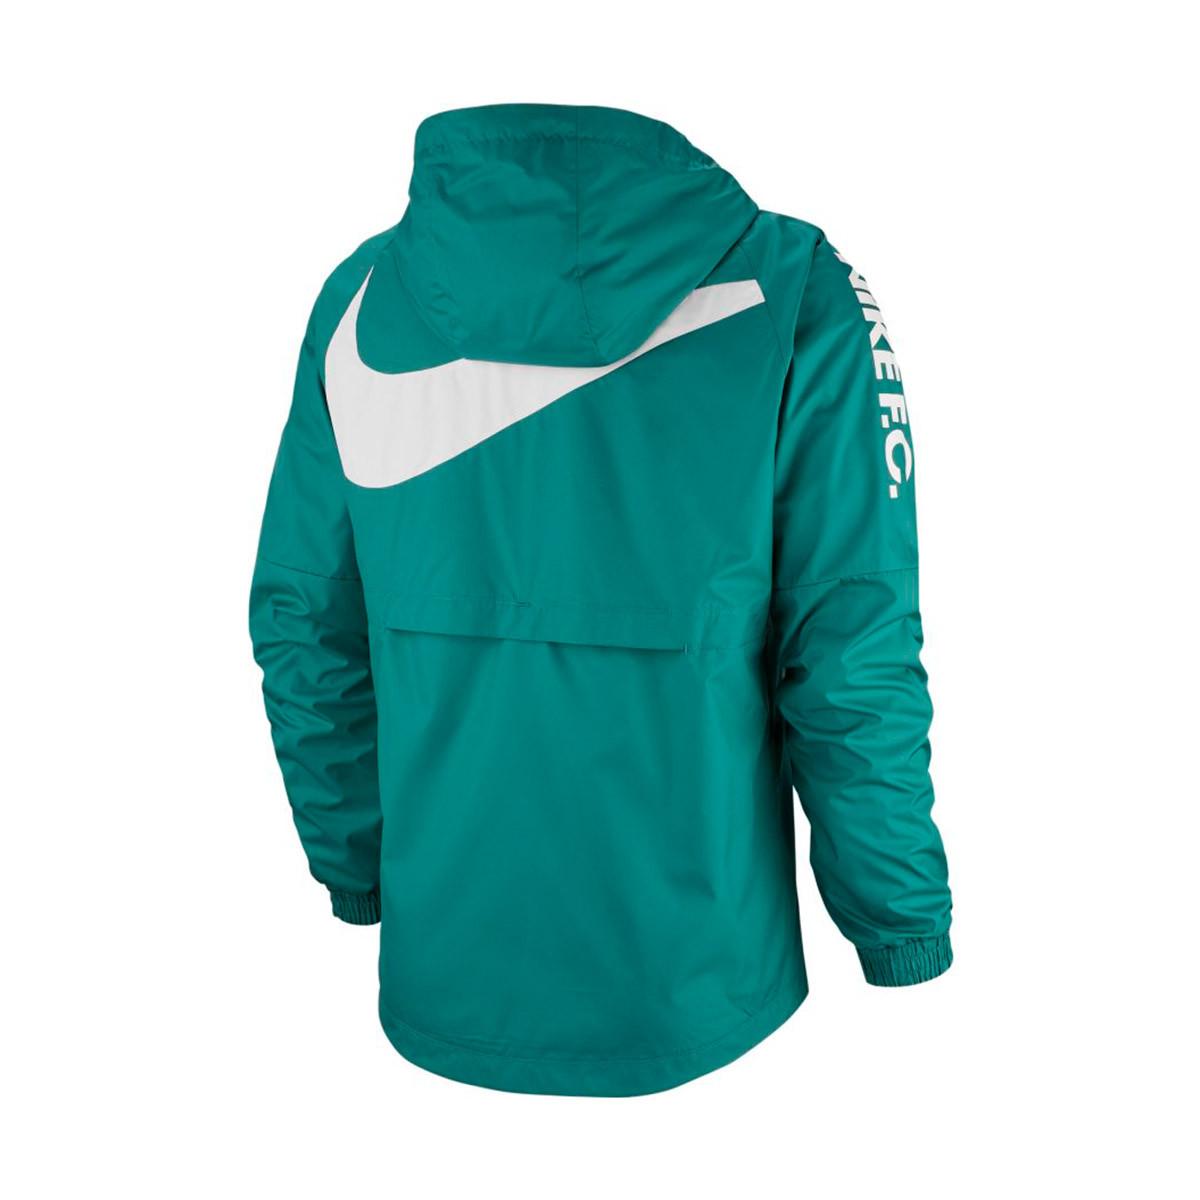 sencillo Año Nuevo Lunar Joya  Chaqueta Nike NIKE F.C. All Weather Fan Bicoastal-White - Tienda de fútbol  Fútbol Emotion